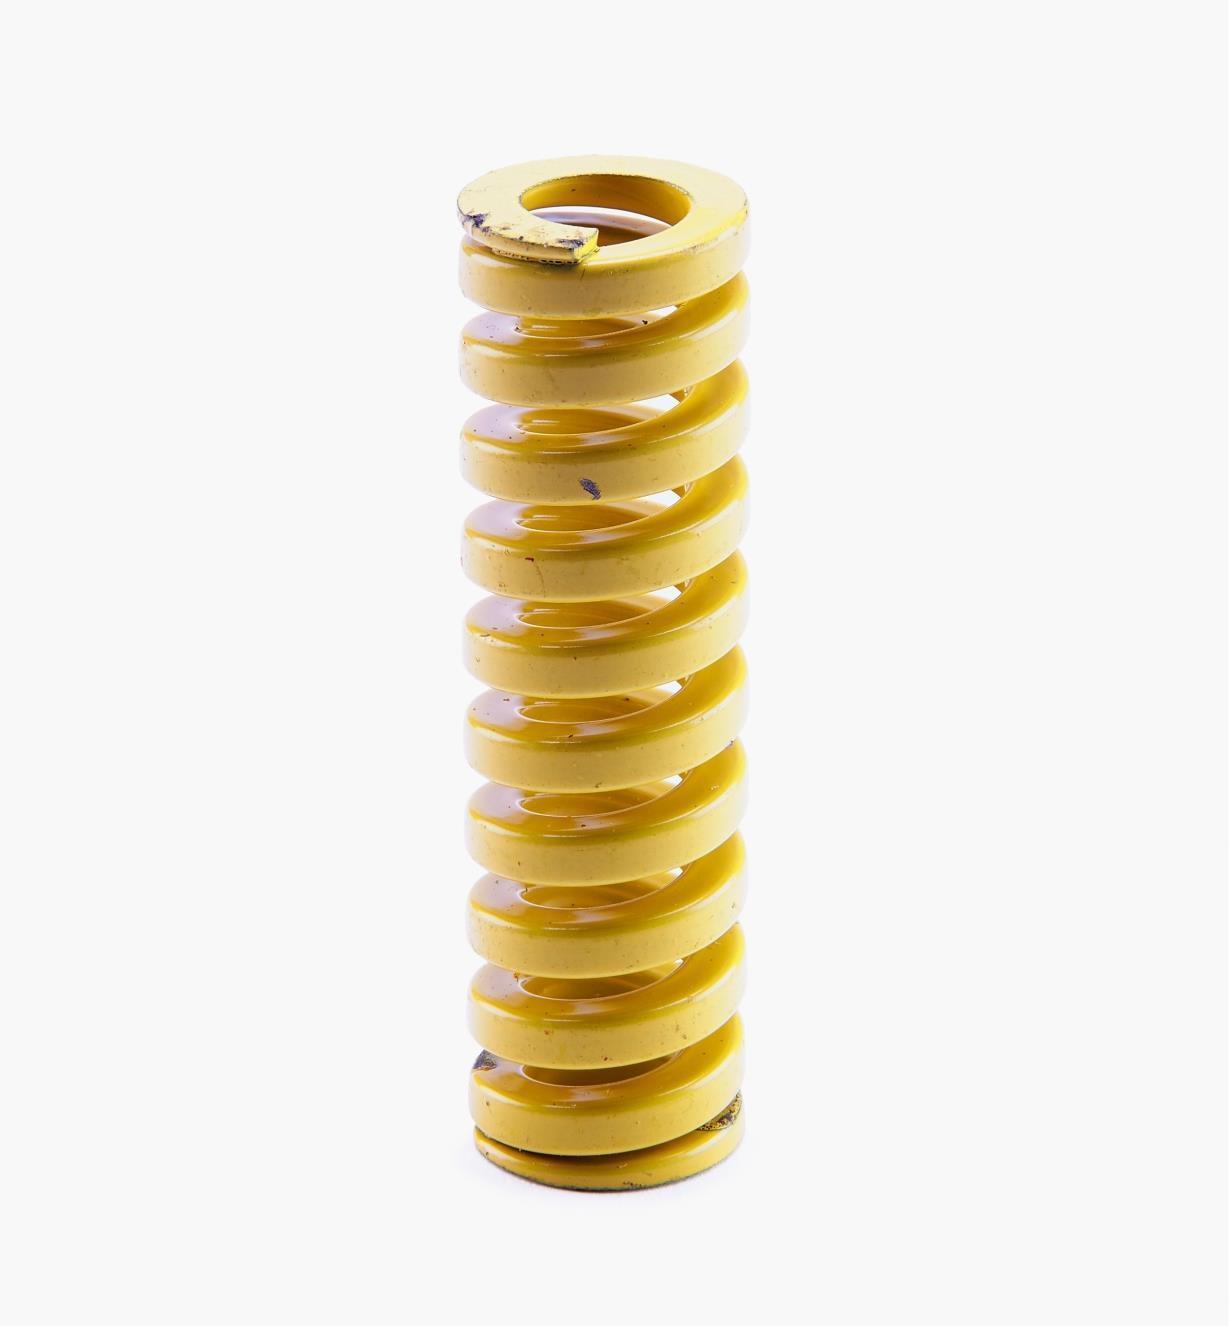 86N5001 - Cobra Coil Tensioning Spring